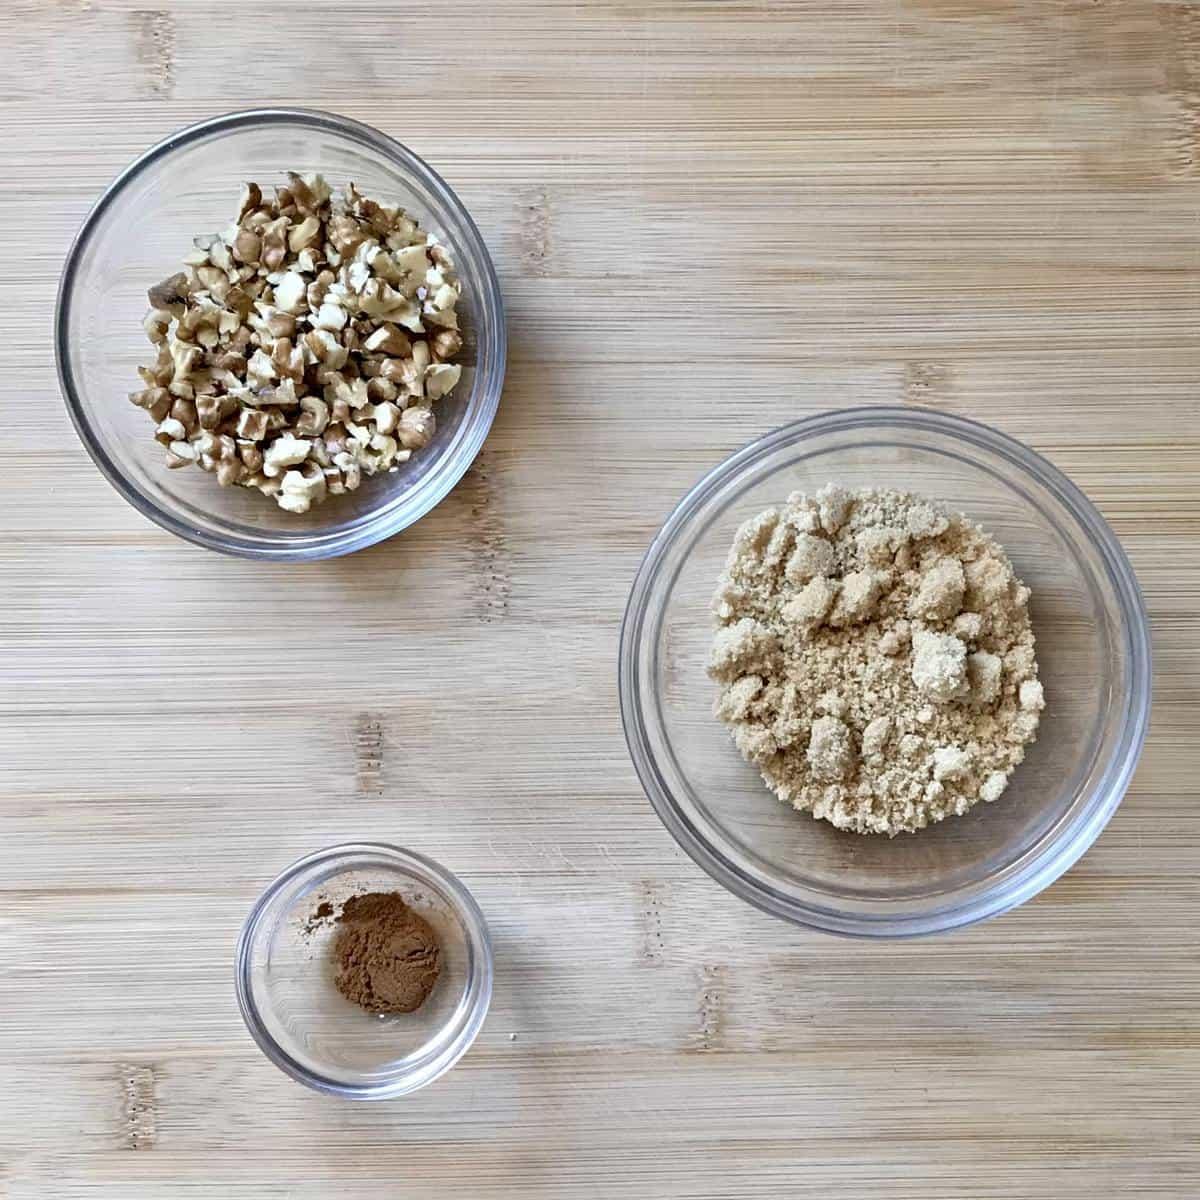 Walnuts, ground cinnamon and brown sugar in individual bowls.